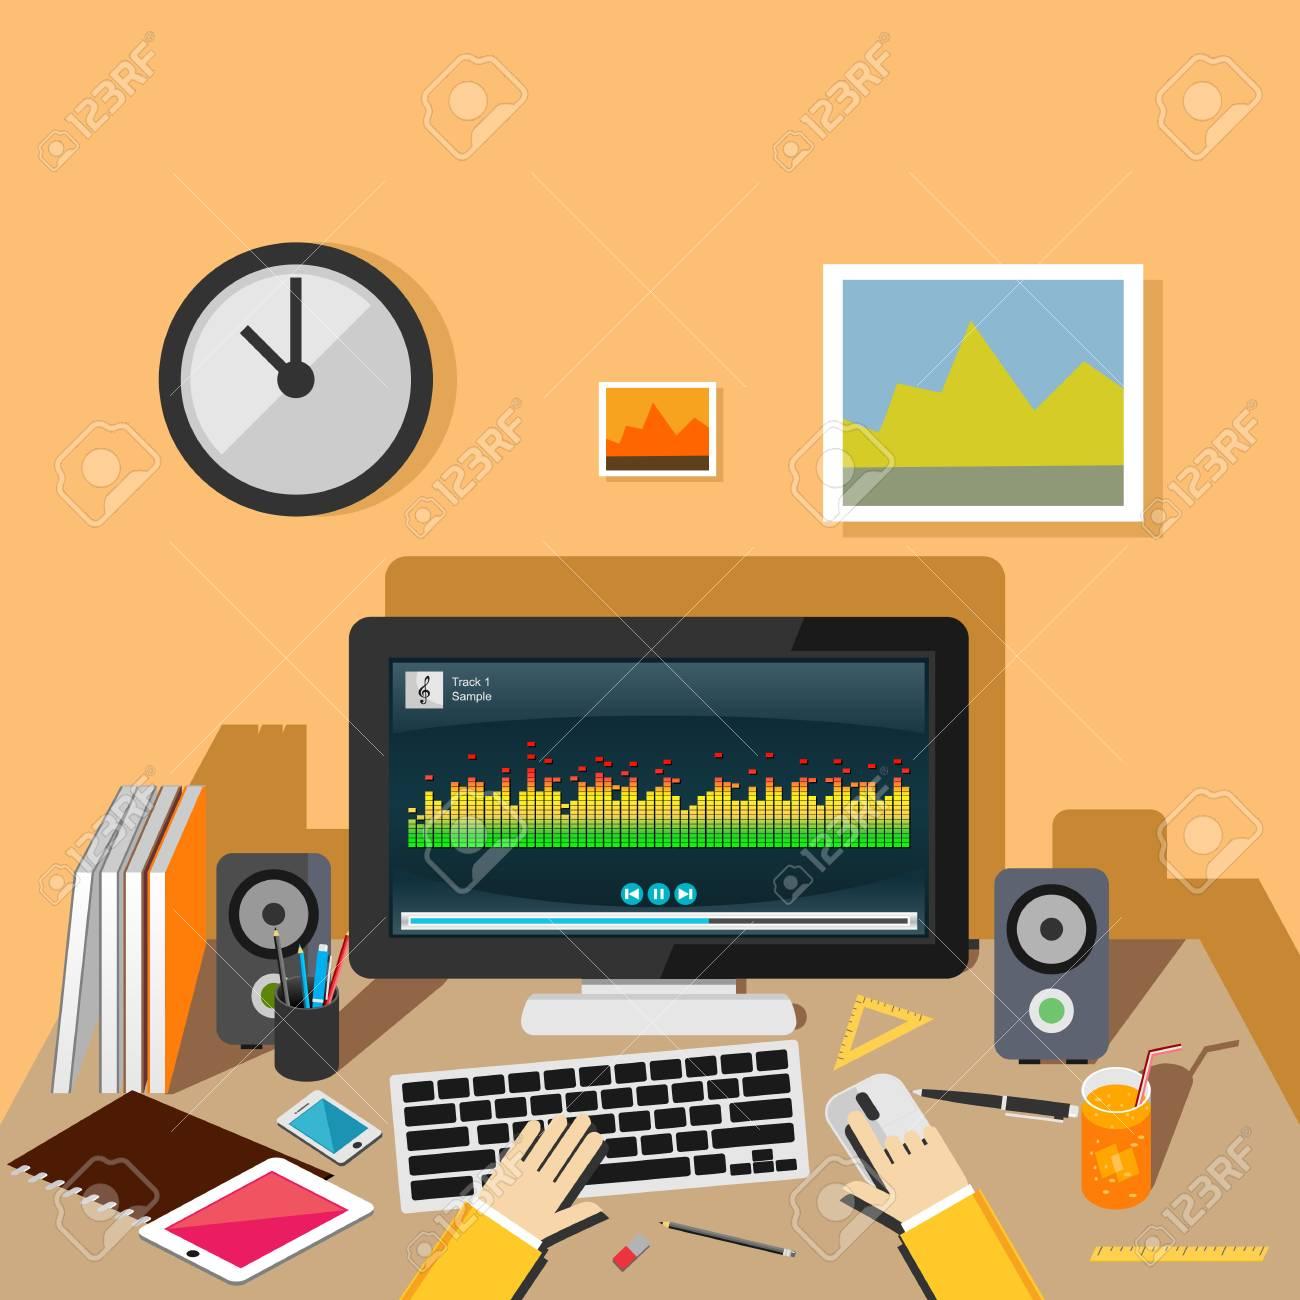 Listening music concept illustration Running music player on